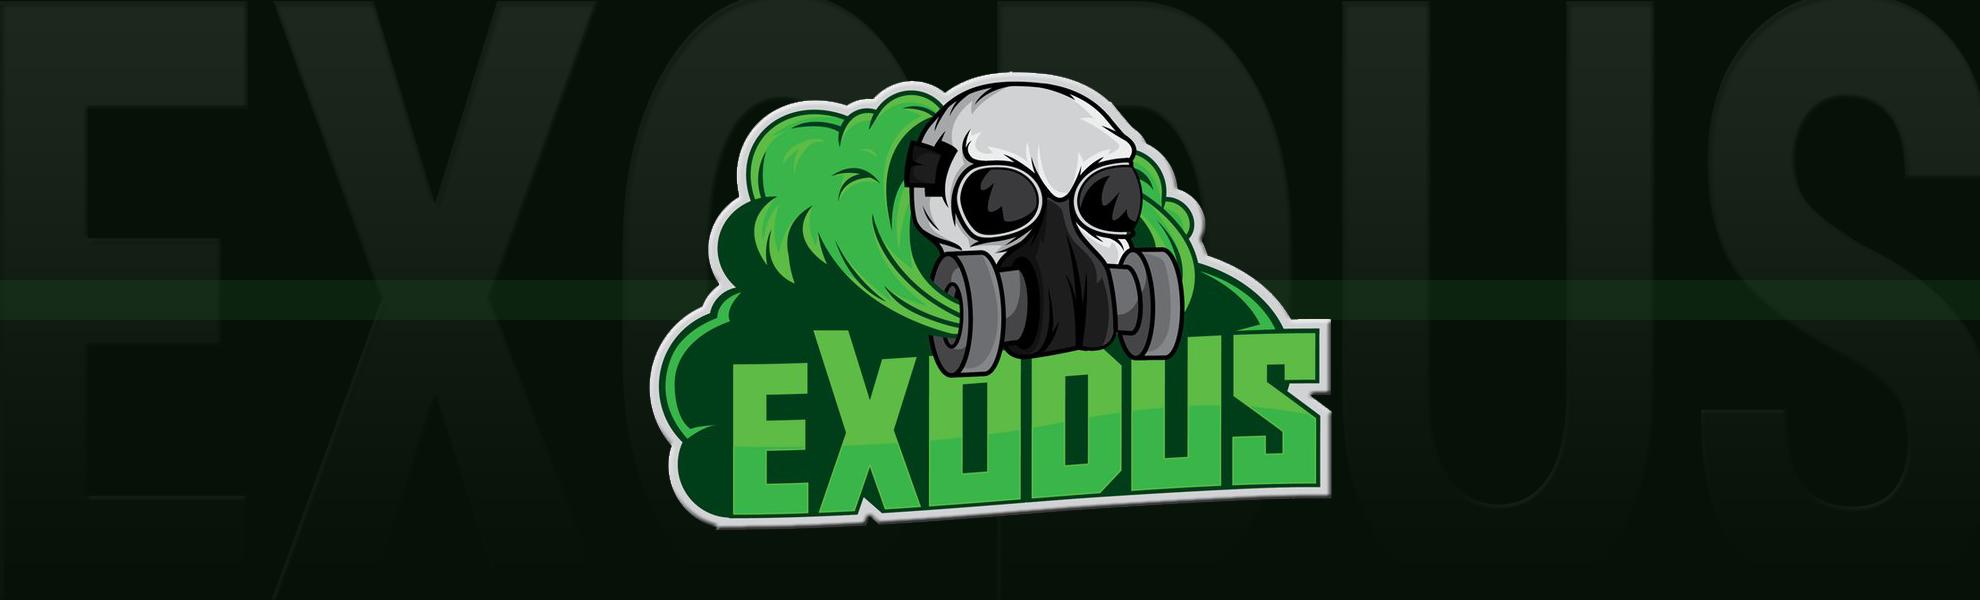 banner_exodus-SL1.png